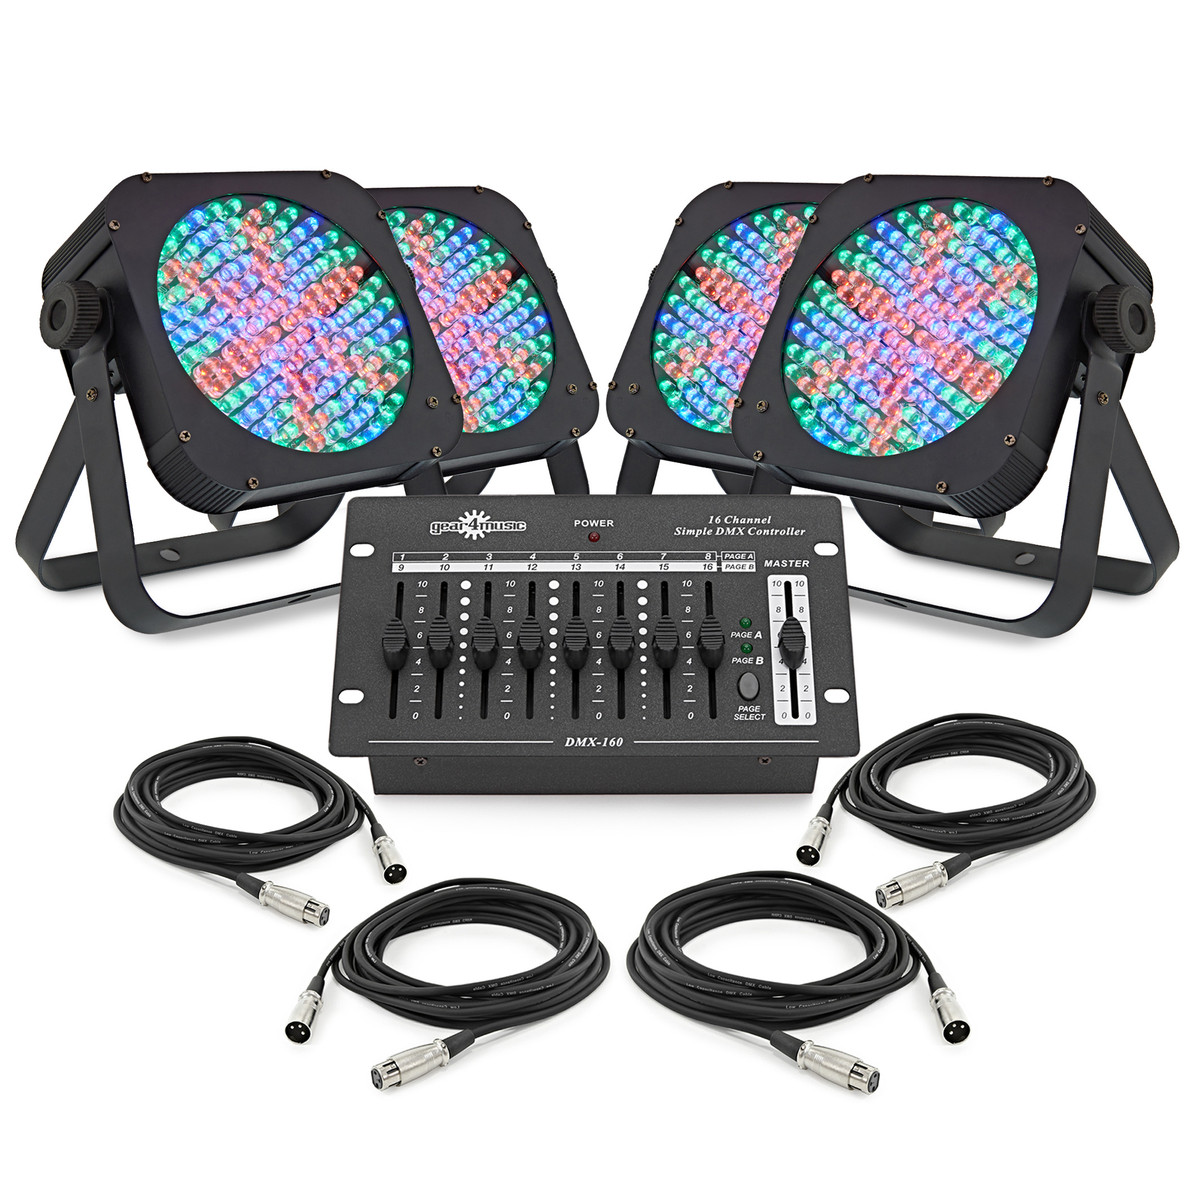 576 x 10mm flat led floor set by gear4music at gear4musiccom for Flat led floor lamp